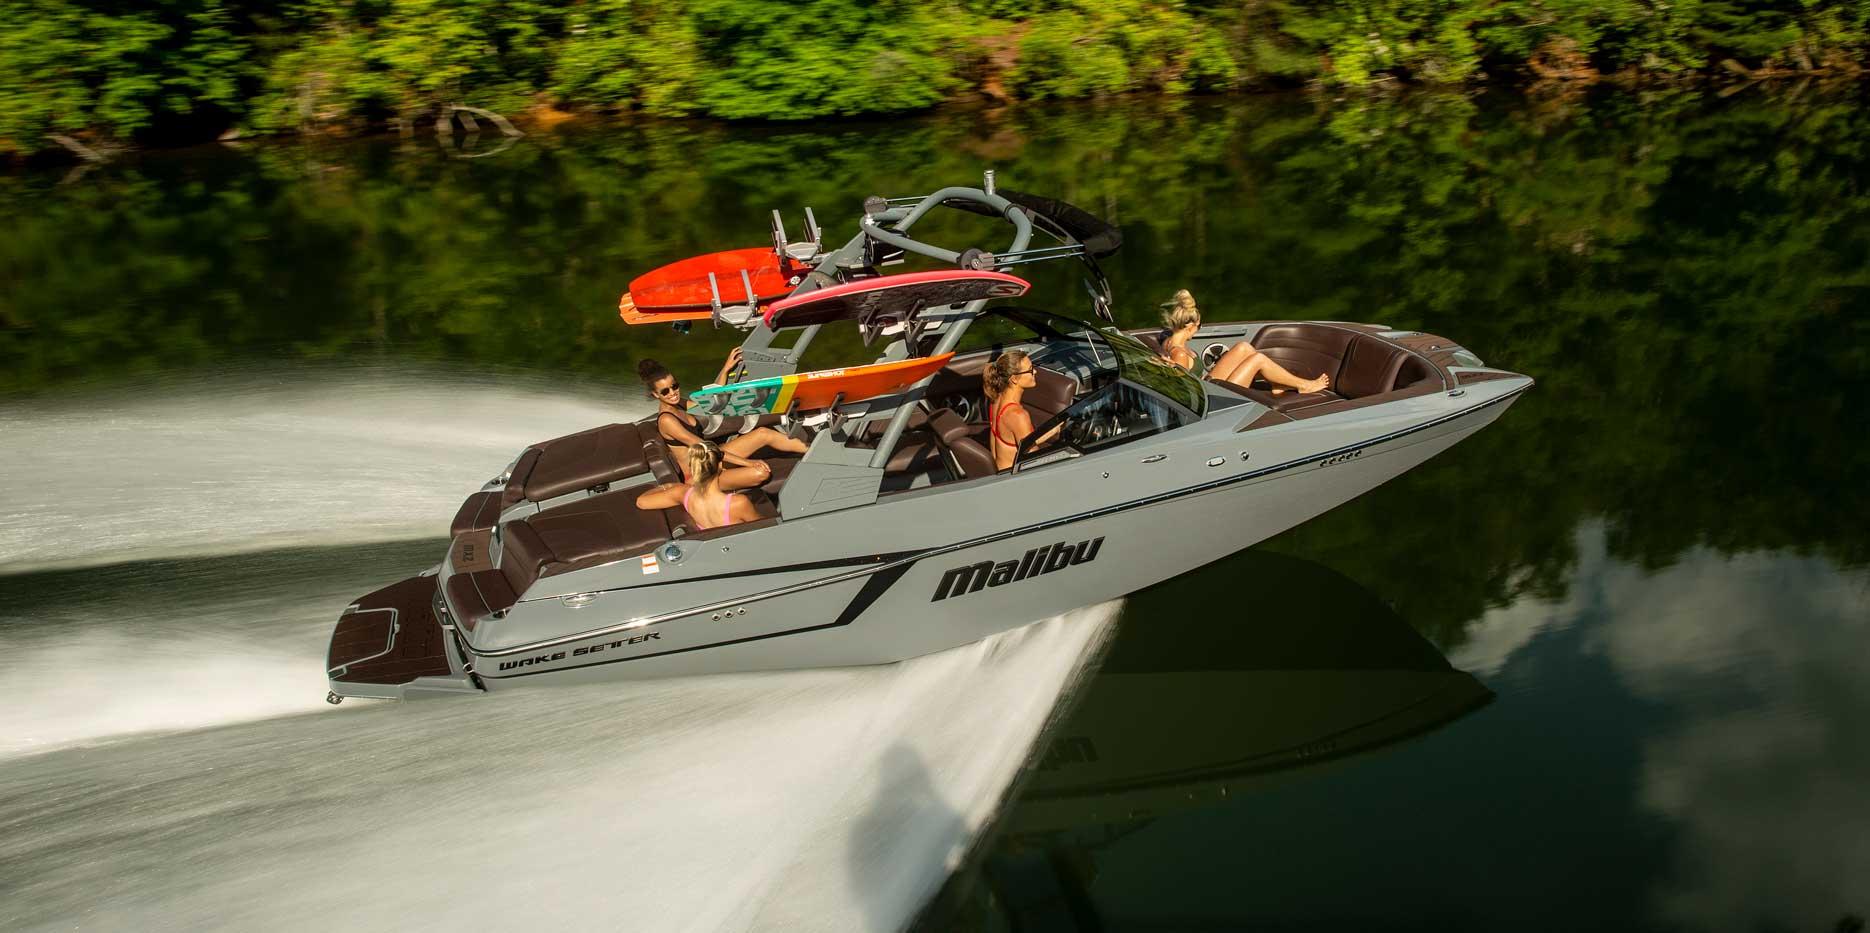 Malibu Boats 22 MXZ cruising